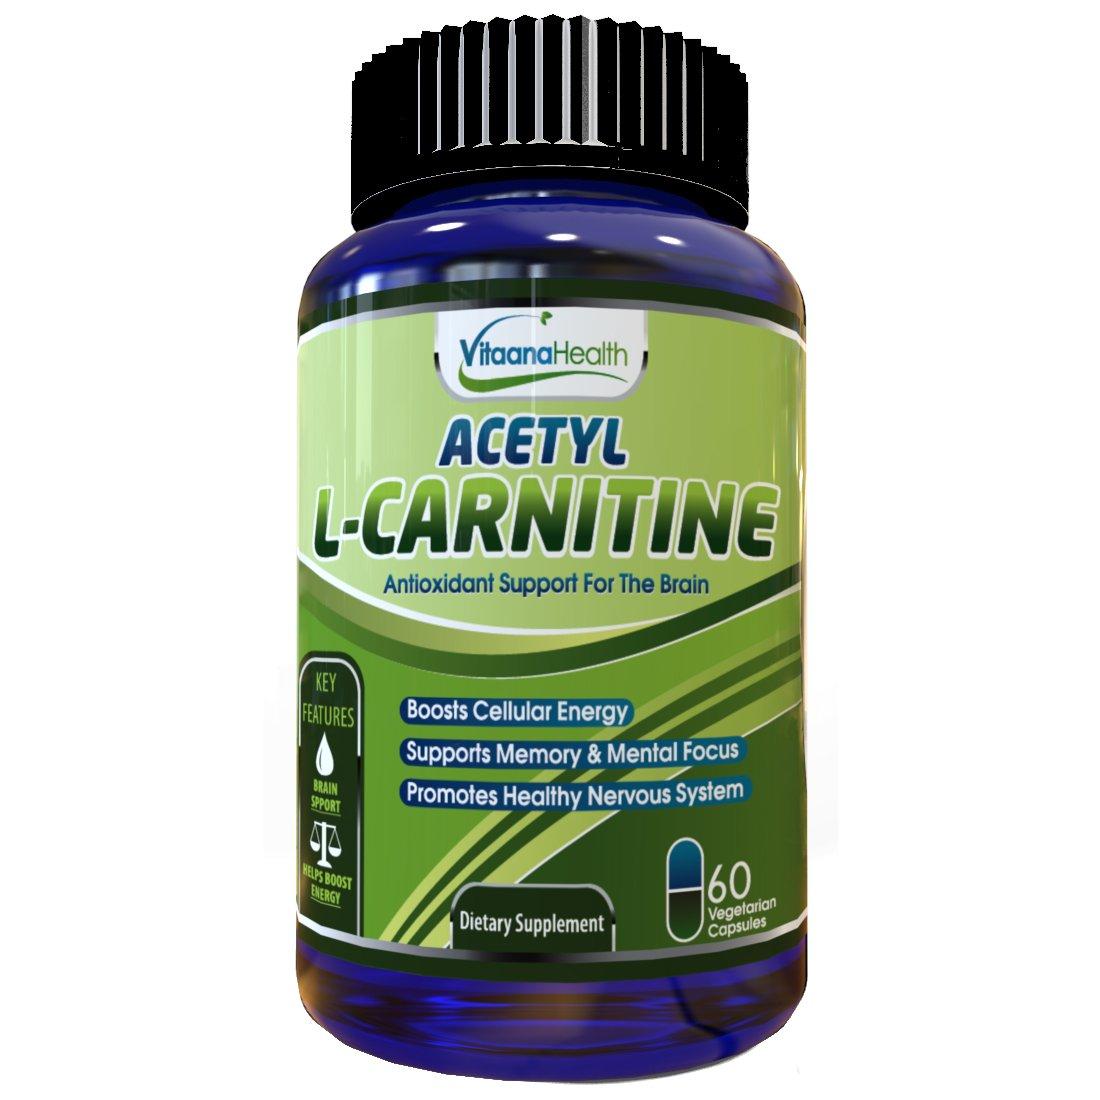 Acetyl L-Carnitine